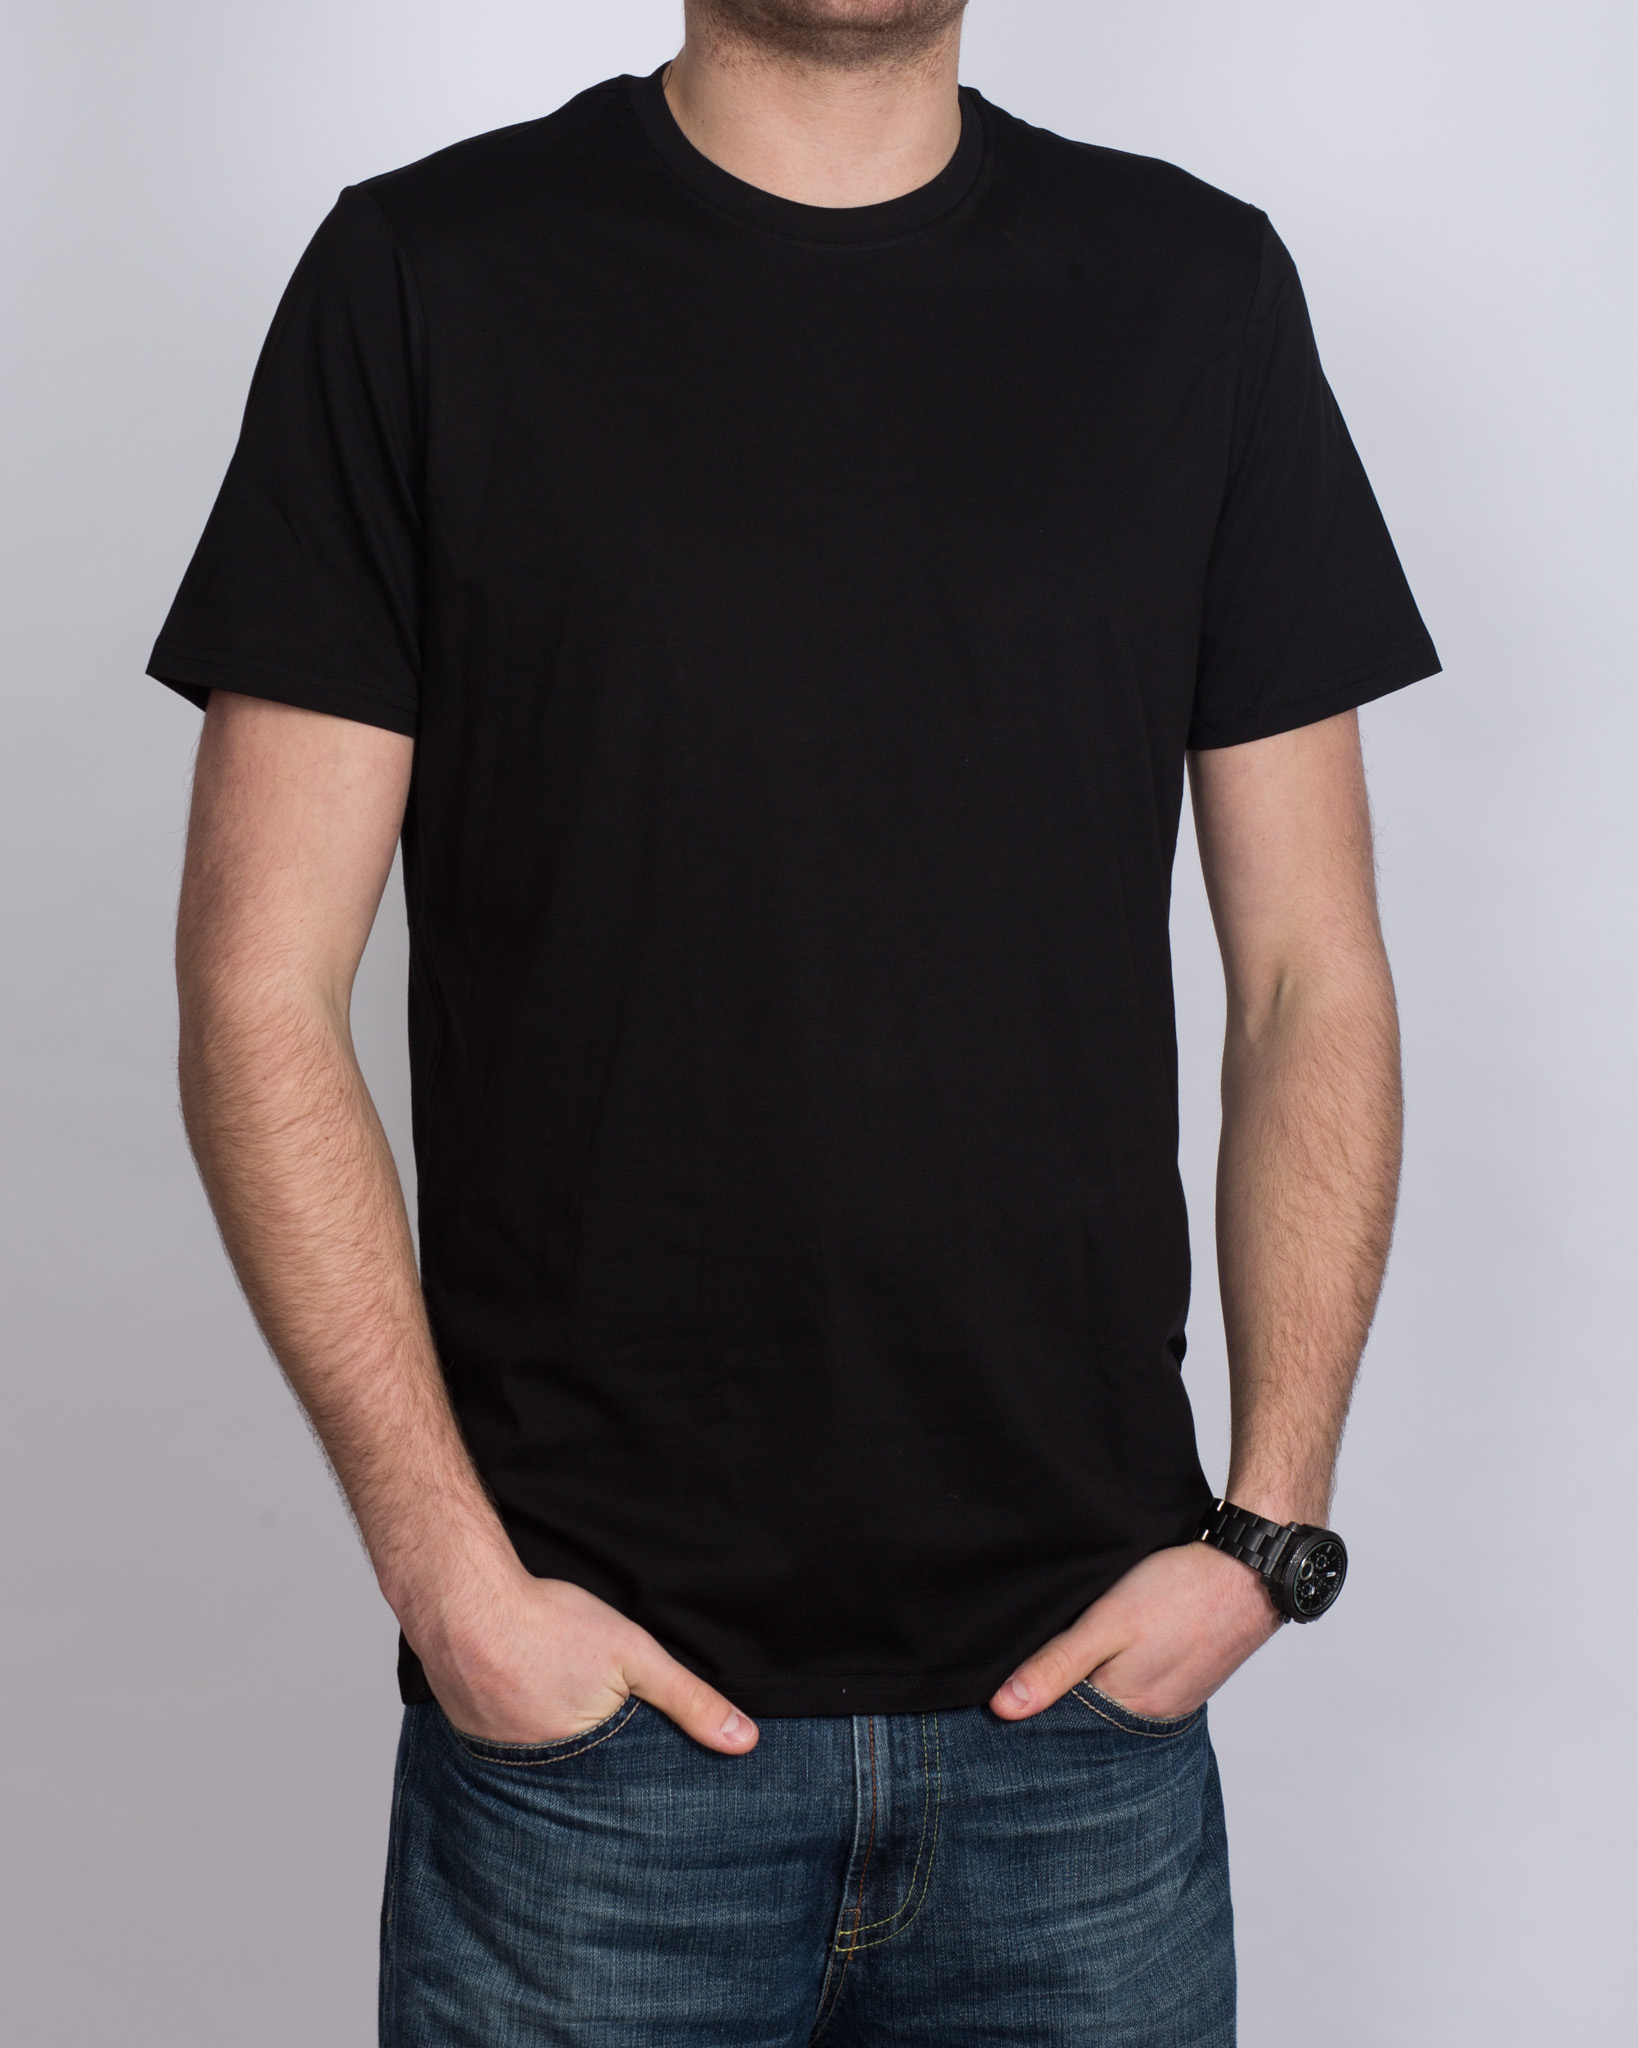 Girav Sydney Tall T-Shirt